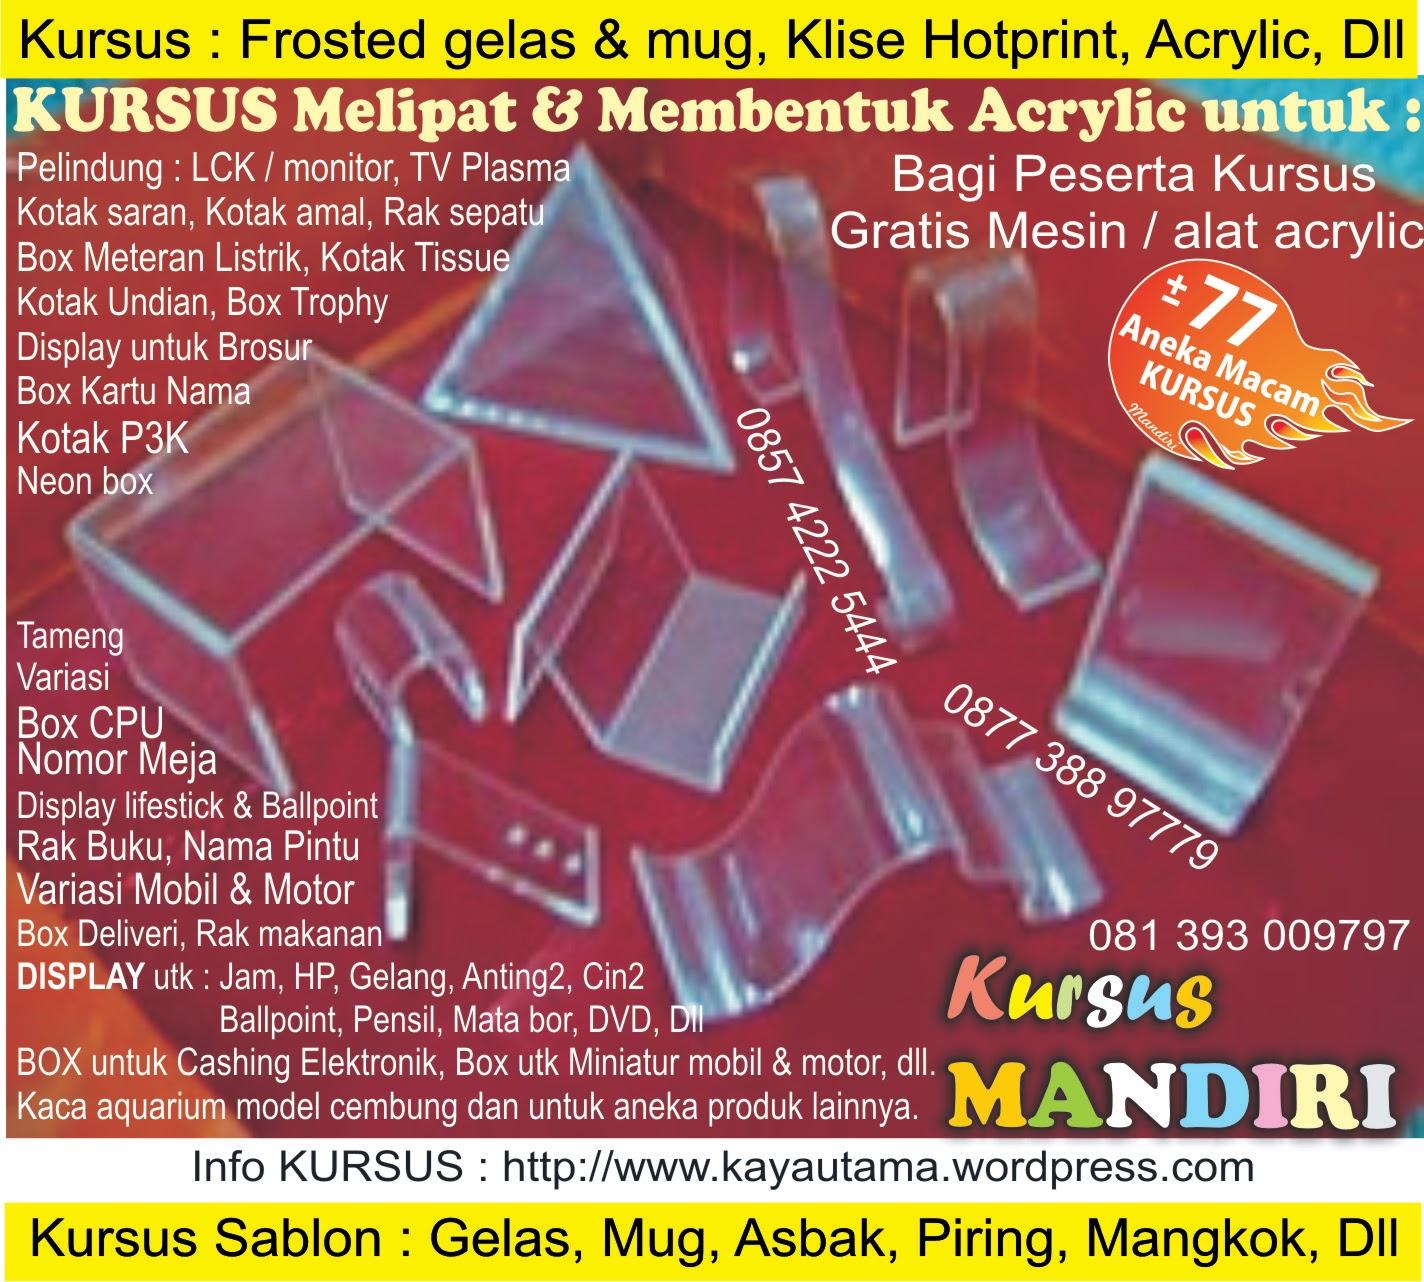 Frosted Glass,Fiberglass,Emboss,Sandblasting,ETSA,Bevell